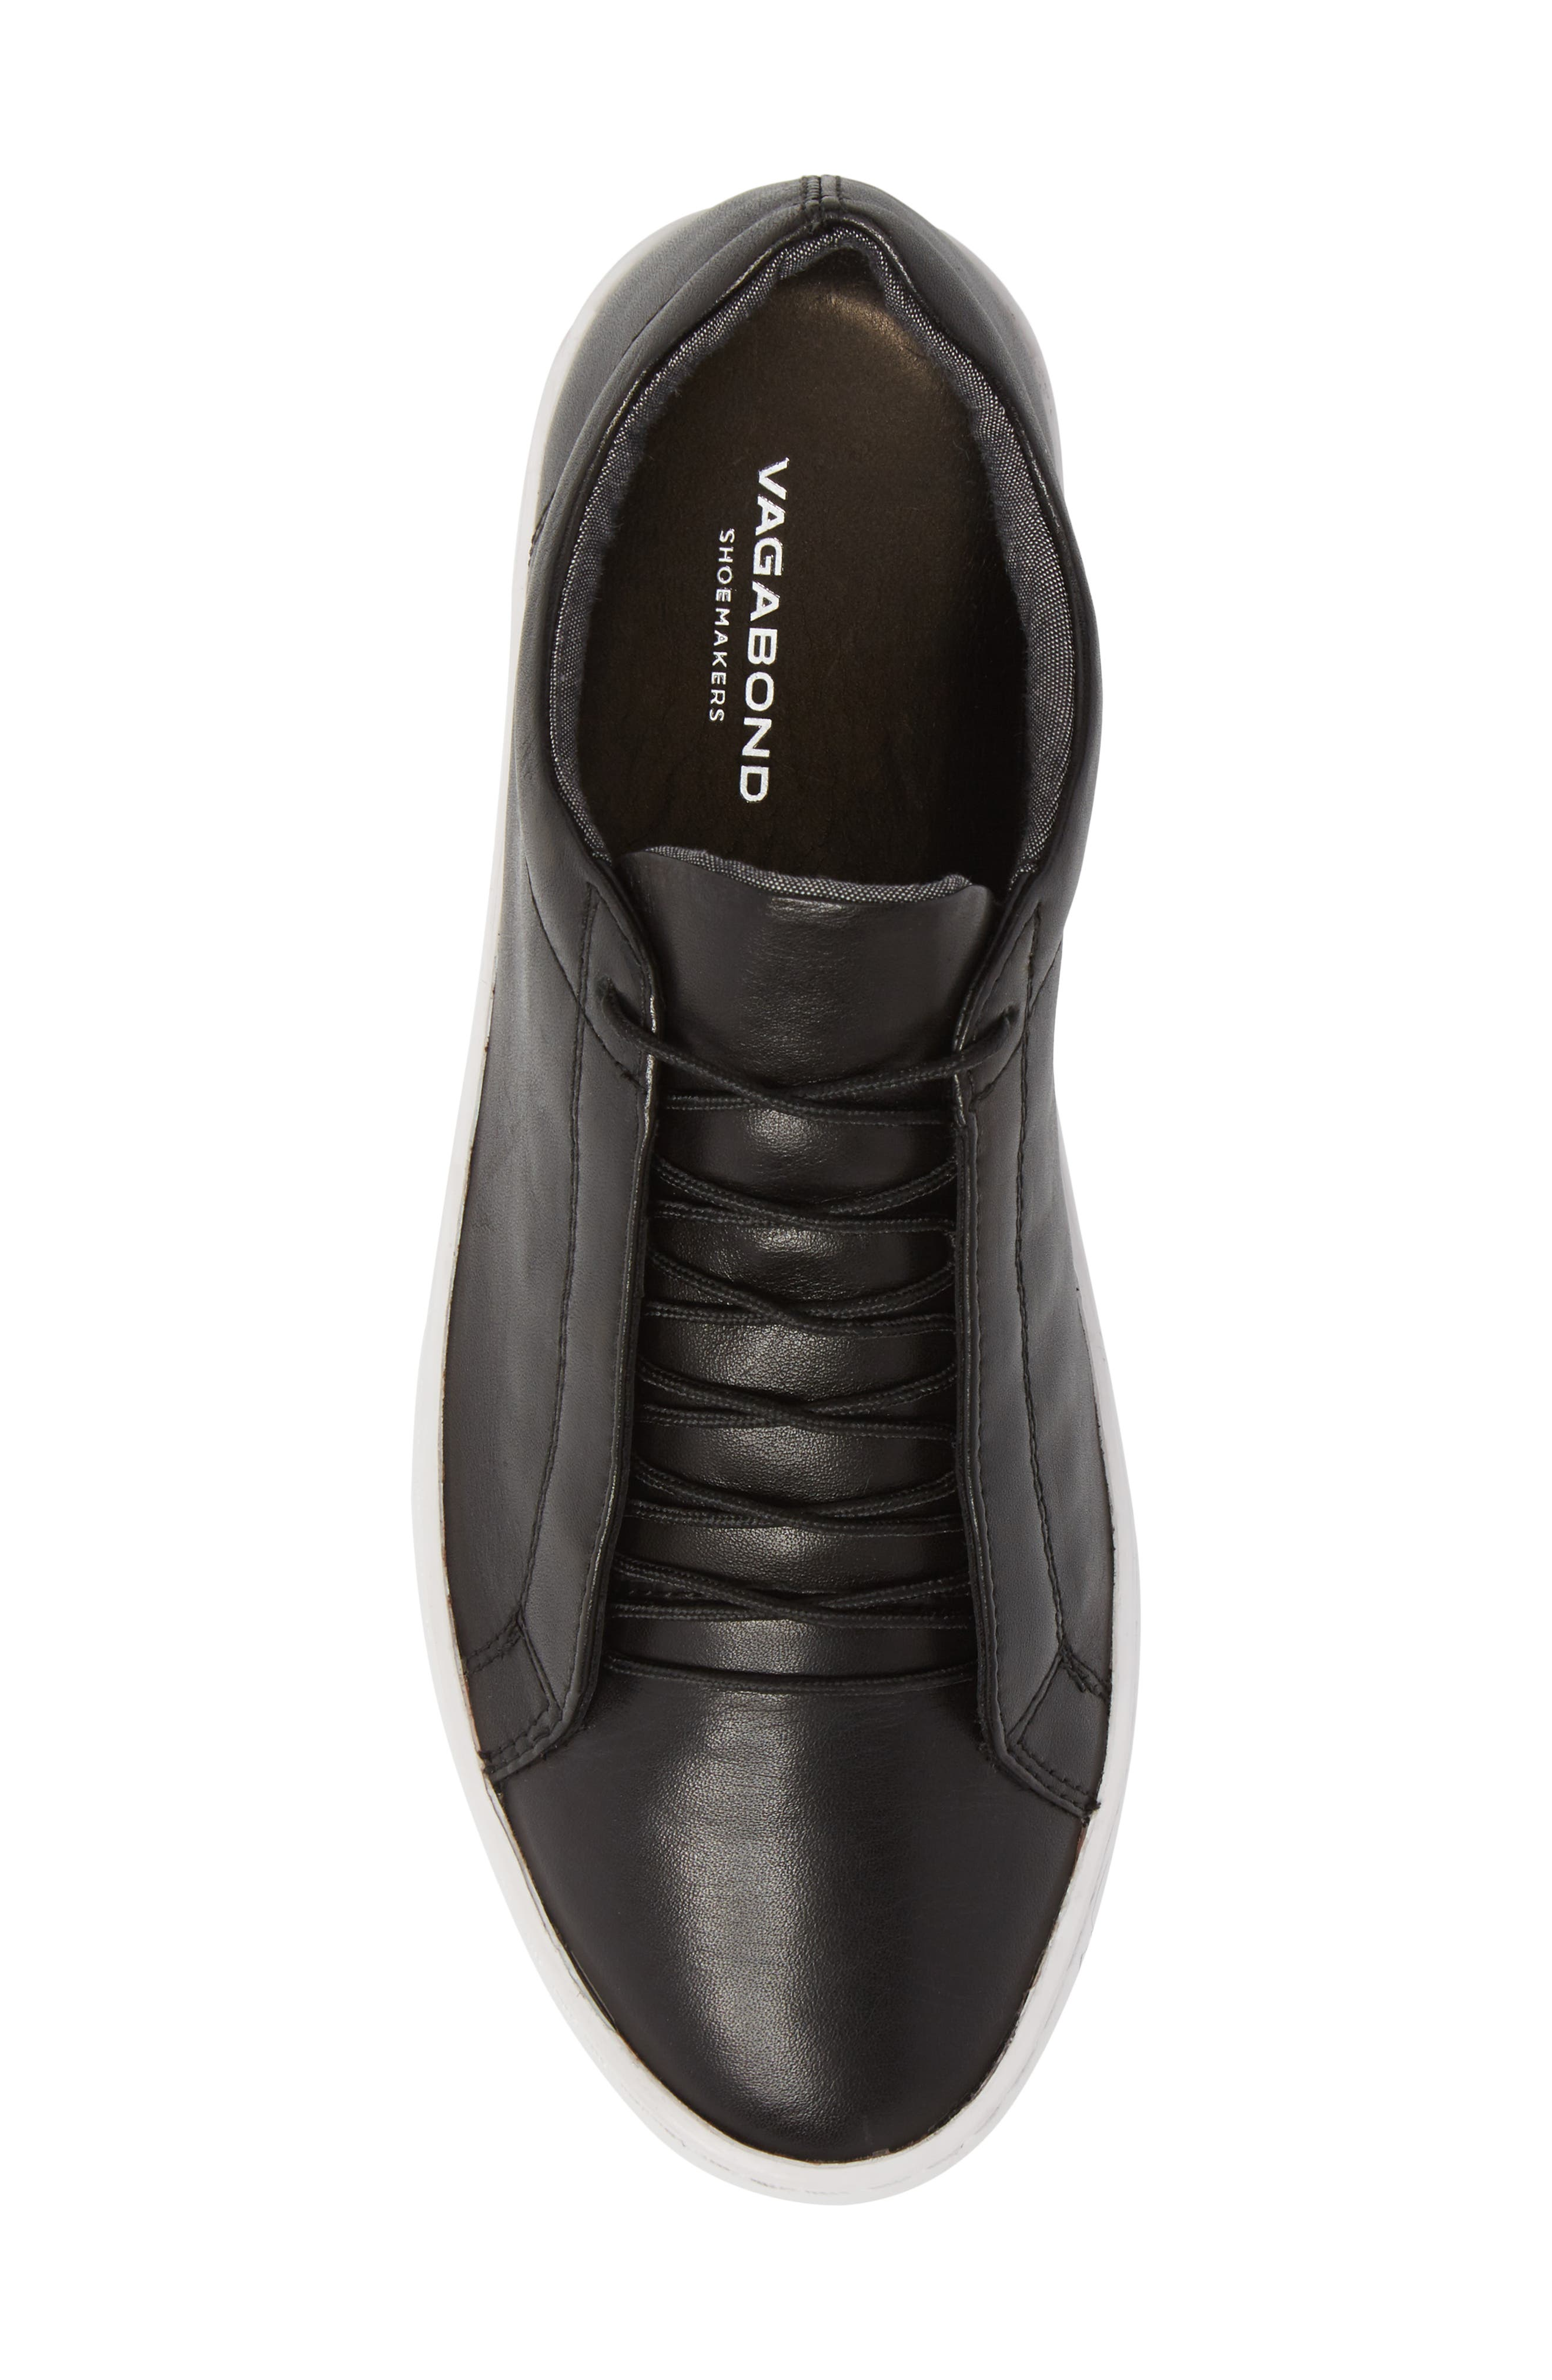 Zoe Sneaker,                             Alternate thumbnail 5, color,                             BLACK LEATHER